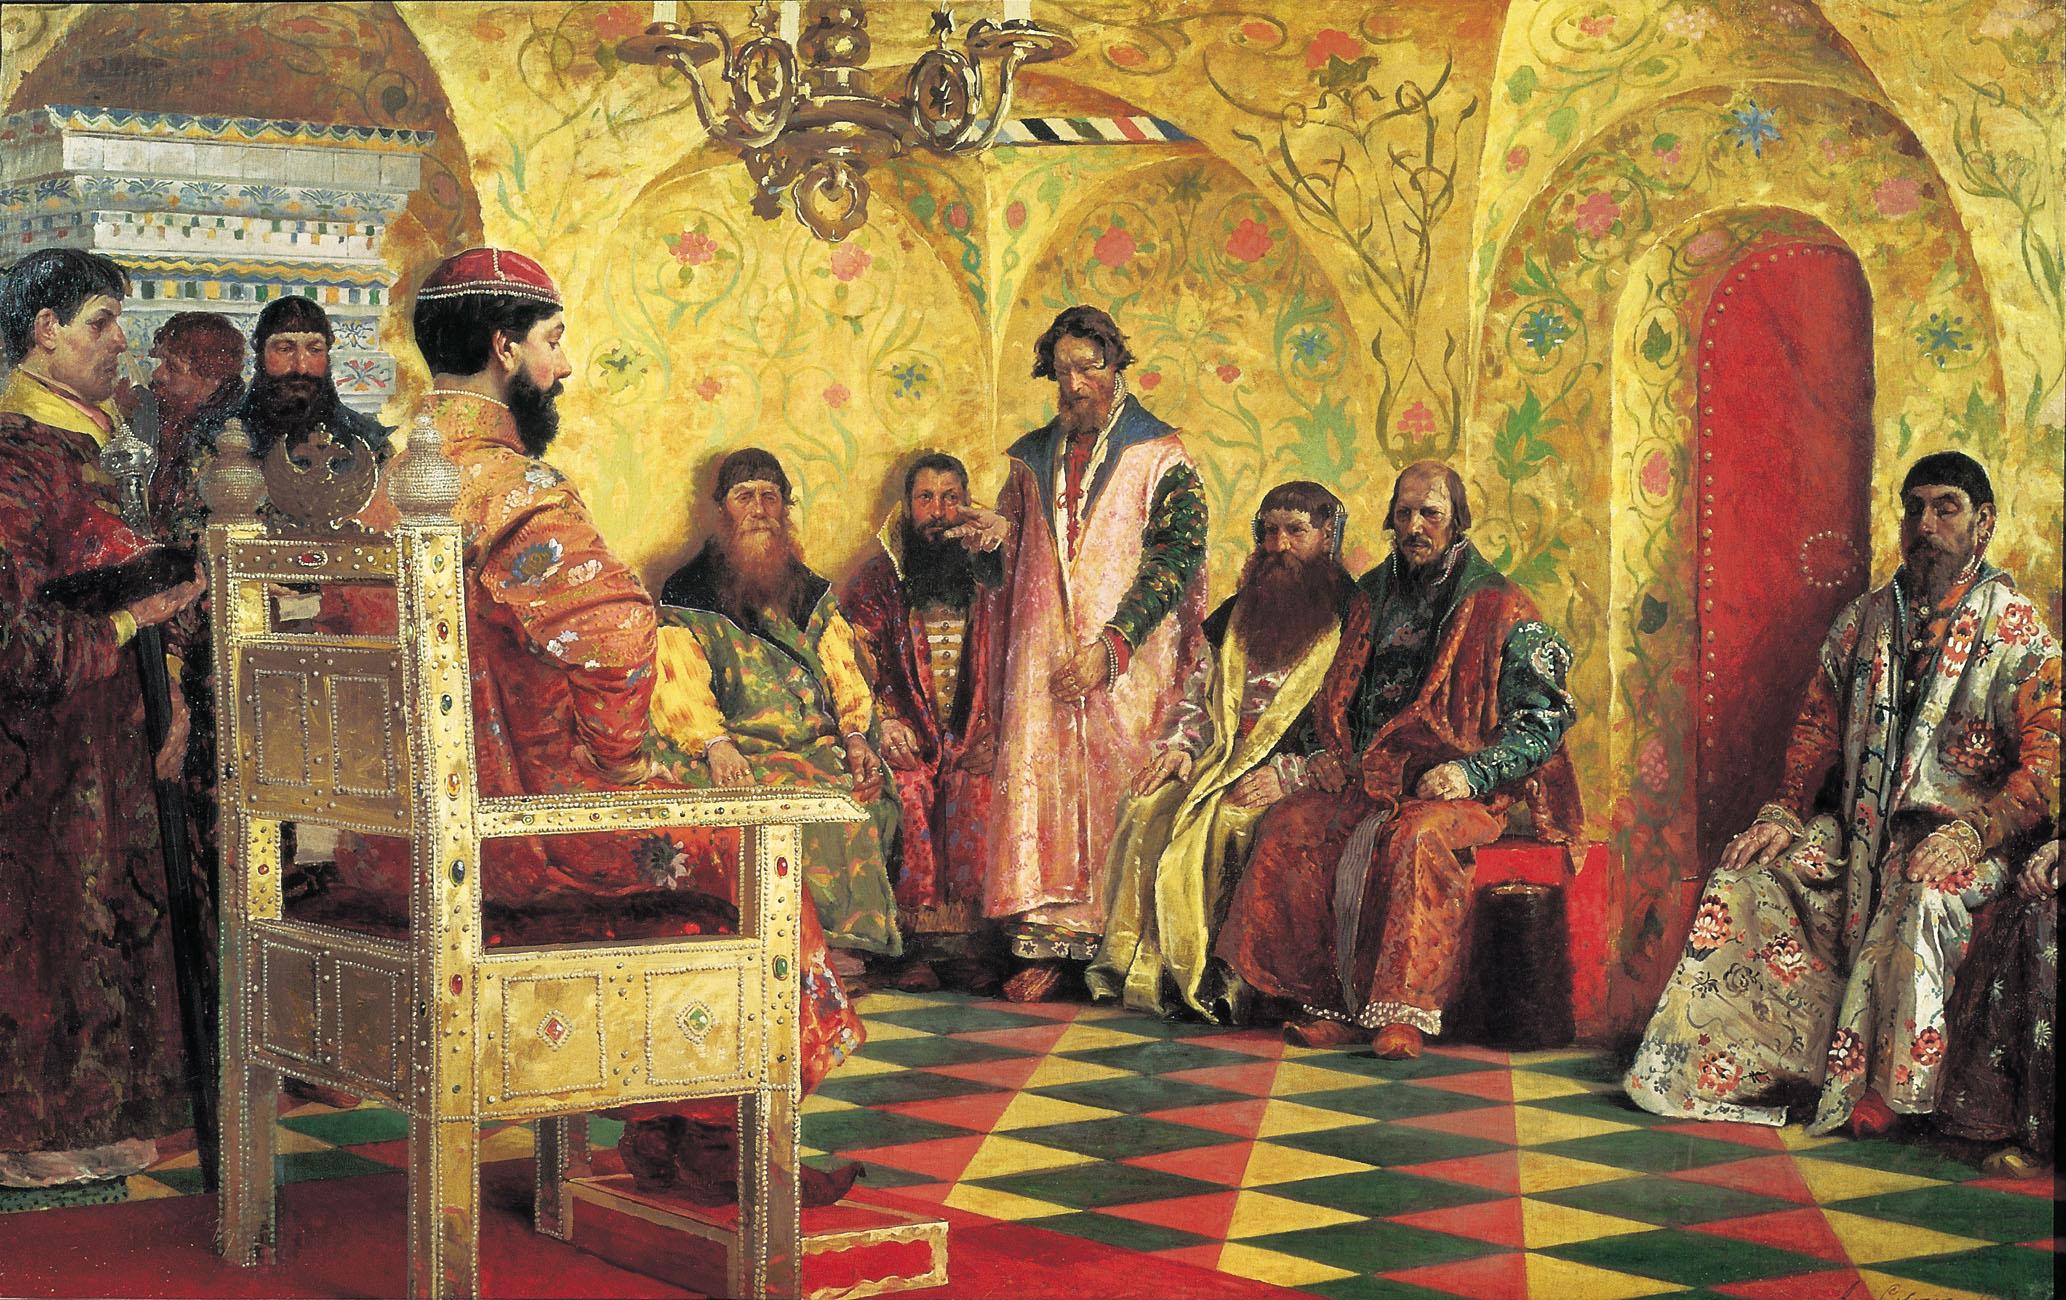 http://dic.academic.ru/pictures/wiki/files/84/Tsar_boyar_duma.jpg